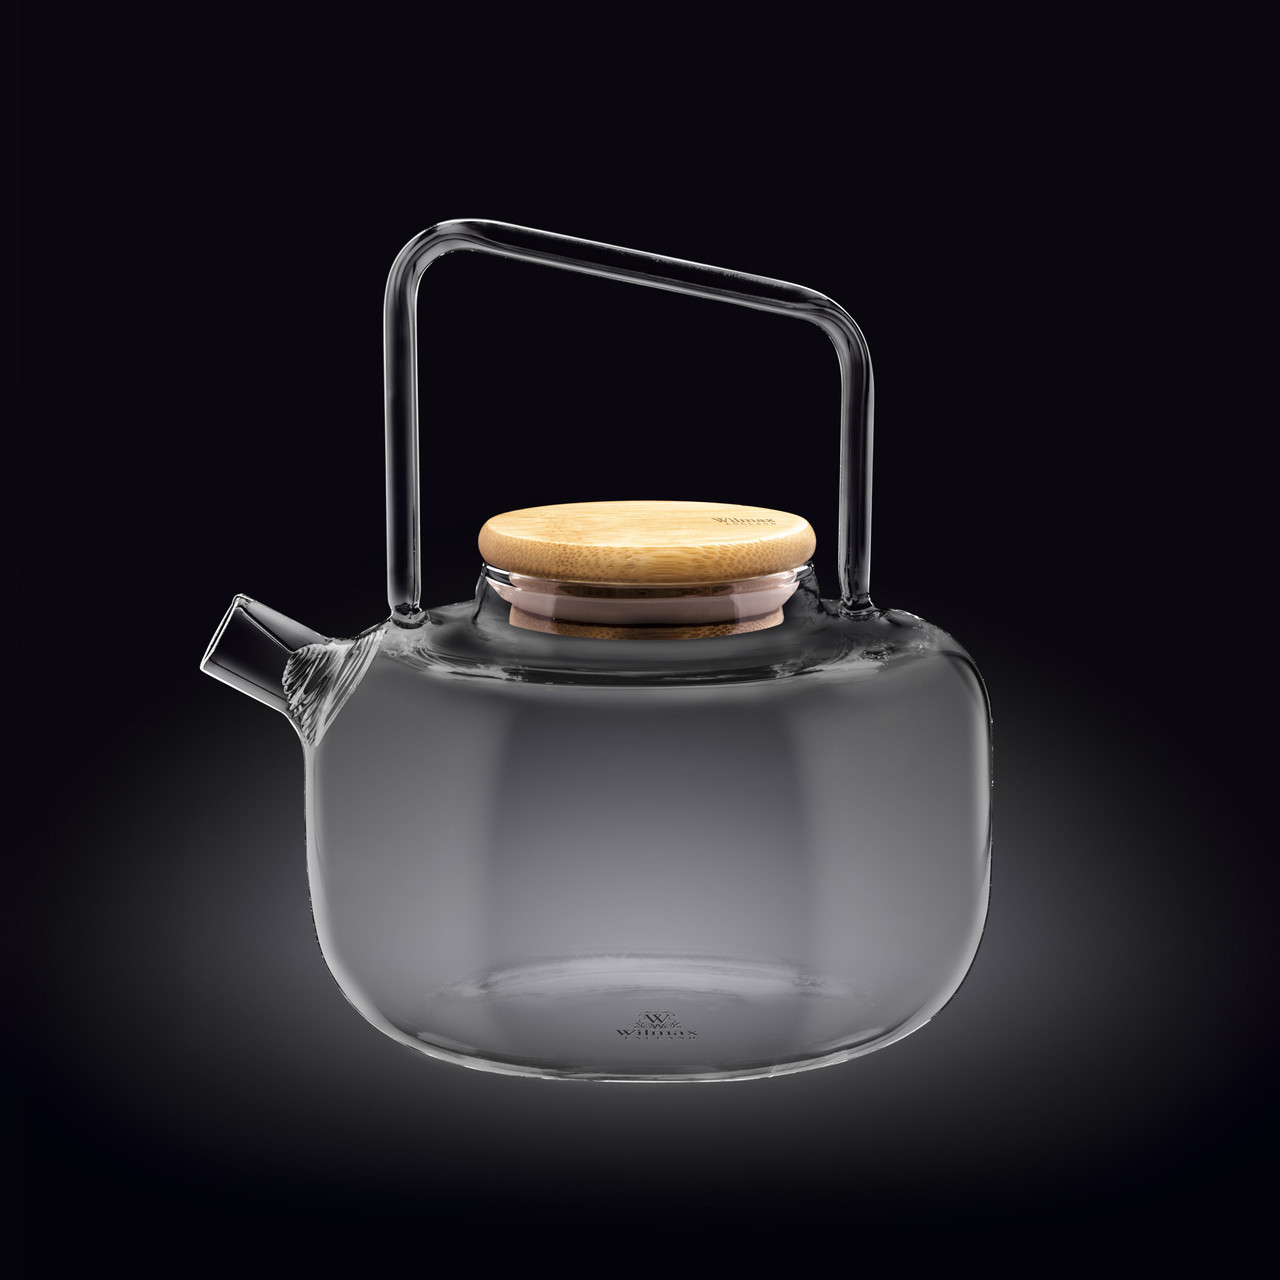 Заварочный чайник с фильтром Wilmax Thermo 1000мл